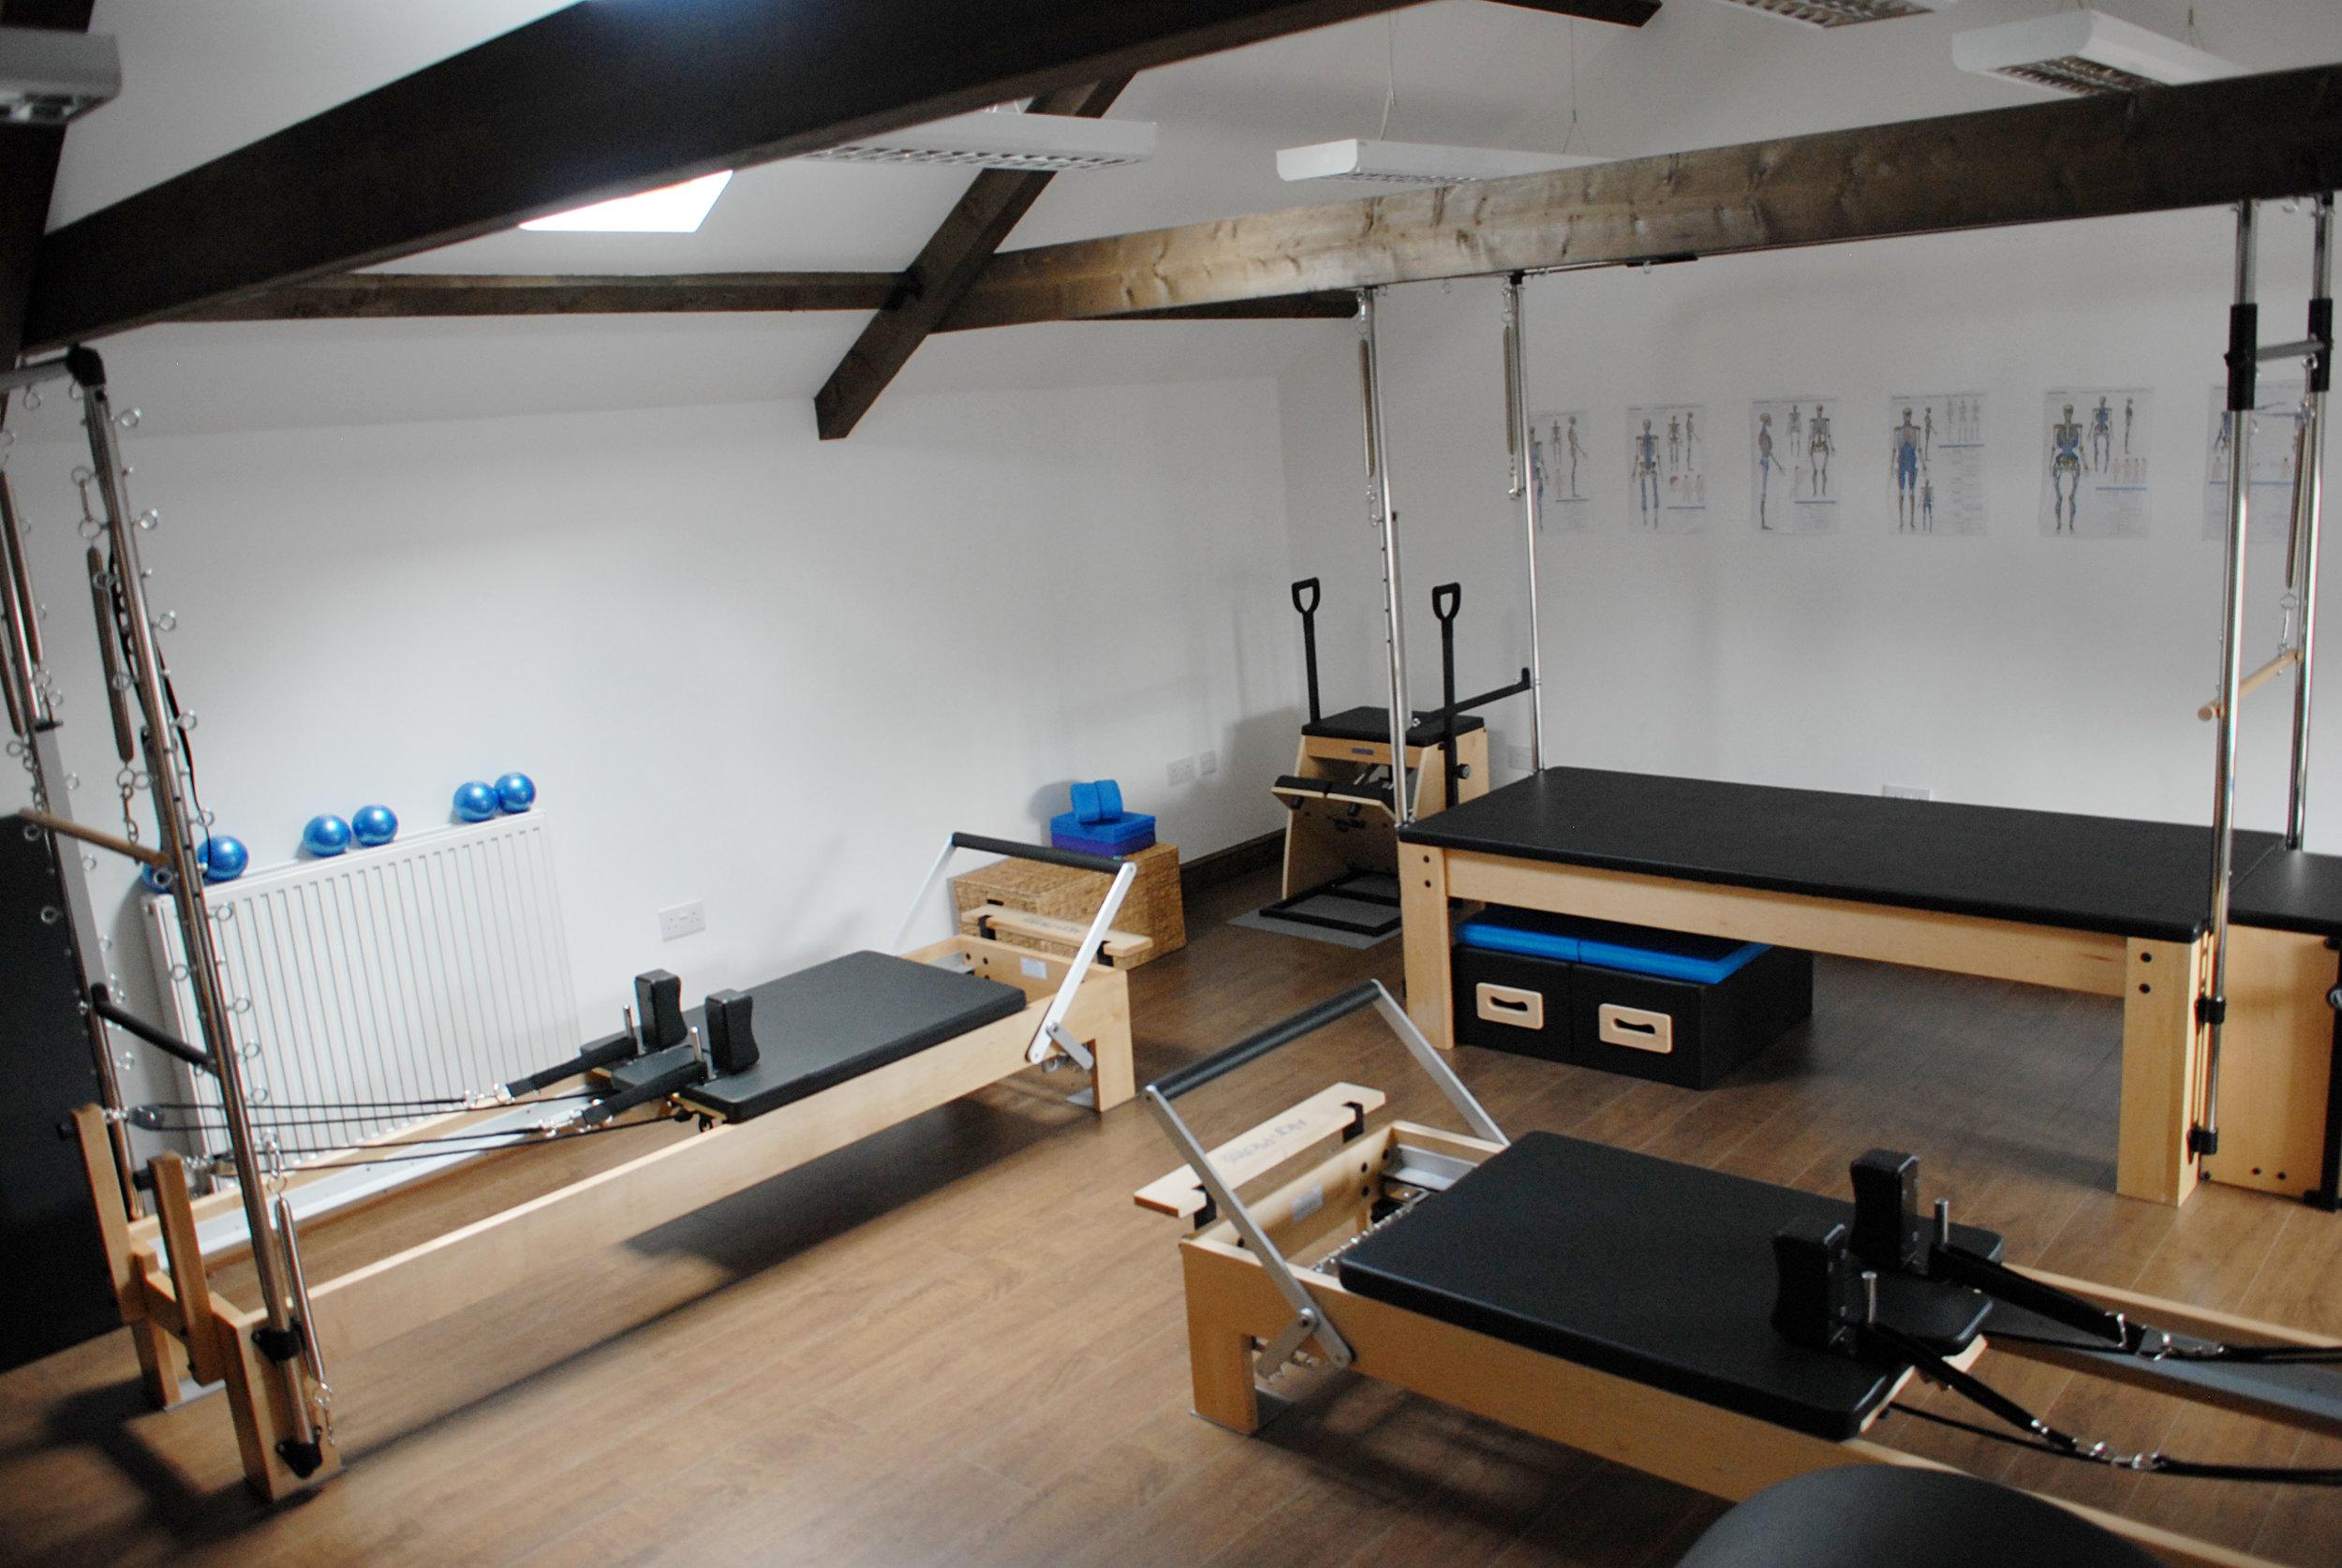 Pilates Apparatus @ Enlightened Body